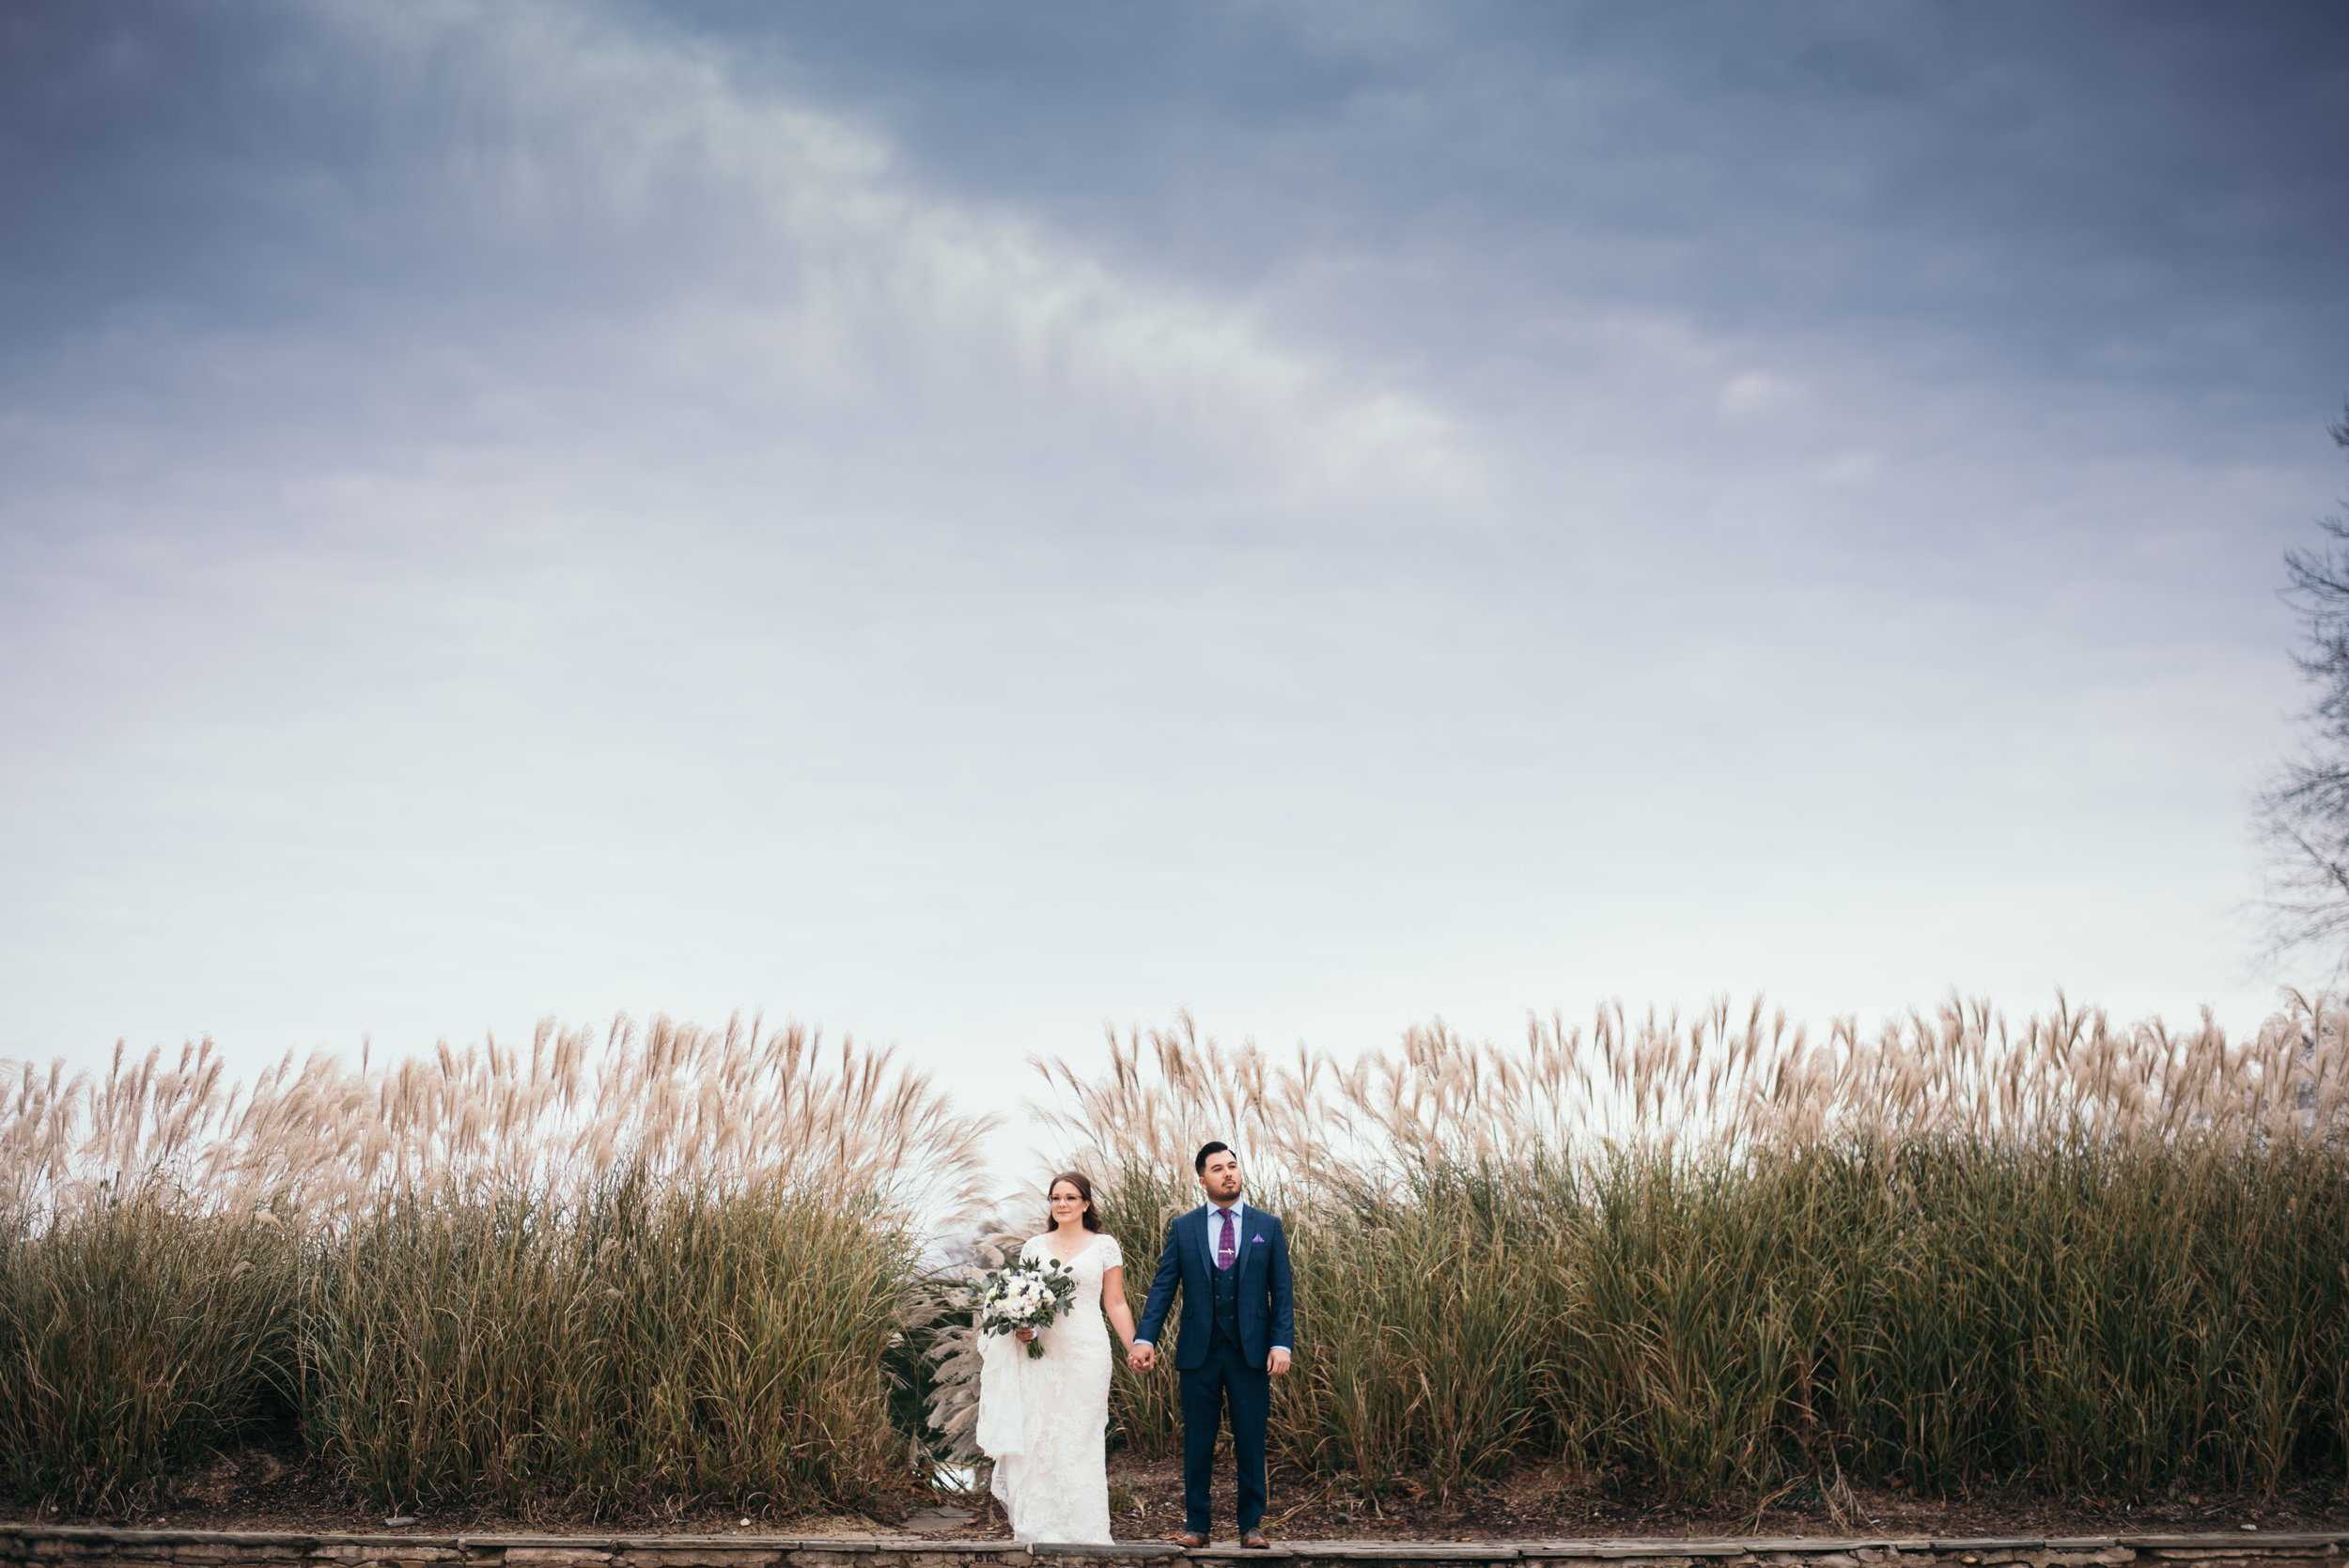 WeddingPhotos | NJPhotographer | Highlights-9-28.jpg